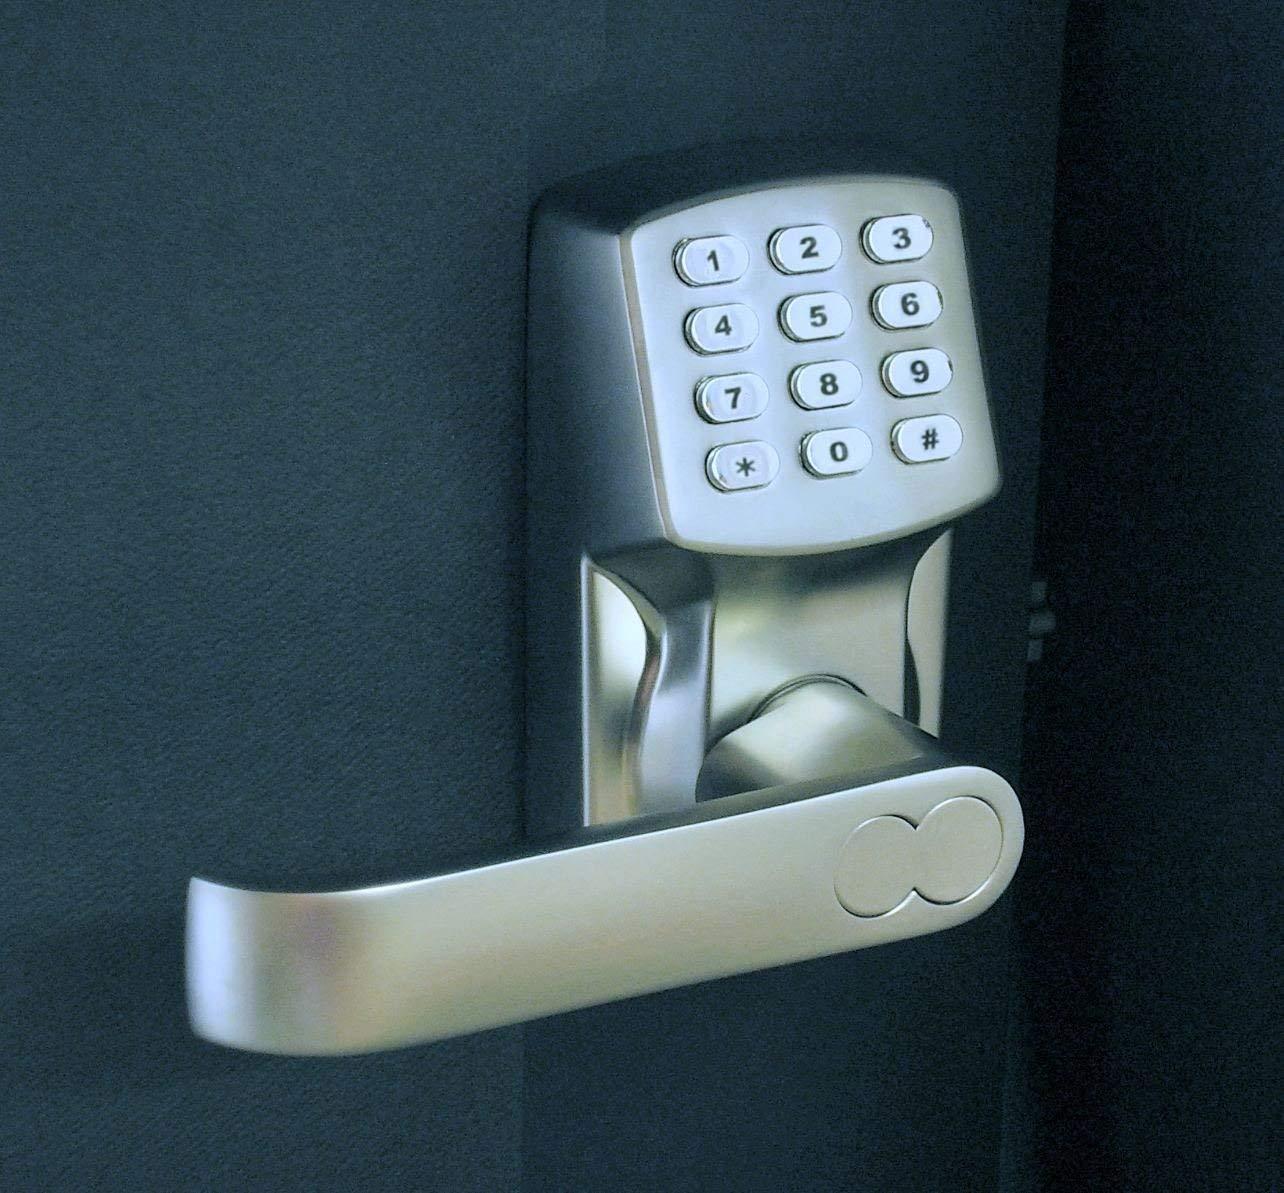 Electronic Keyless Door Lock Set - Satin Nickel (For Left-Hinged Doors Only) by Gino Development (Image #2)